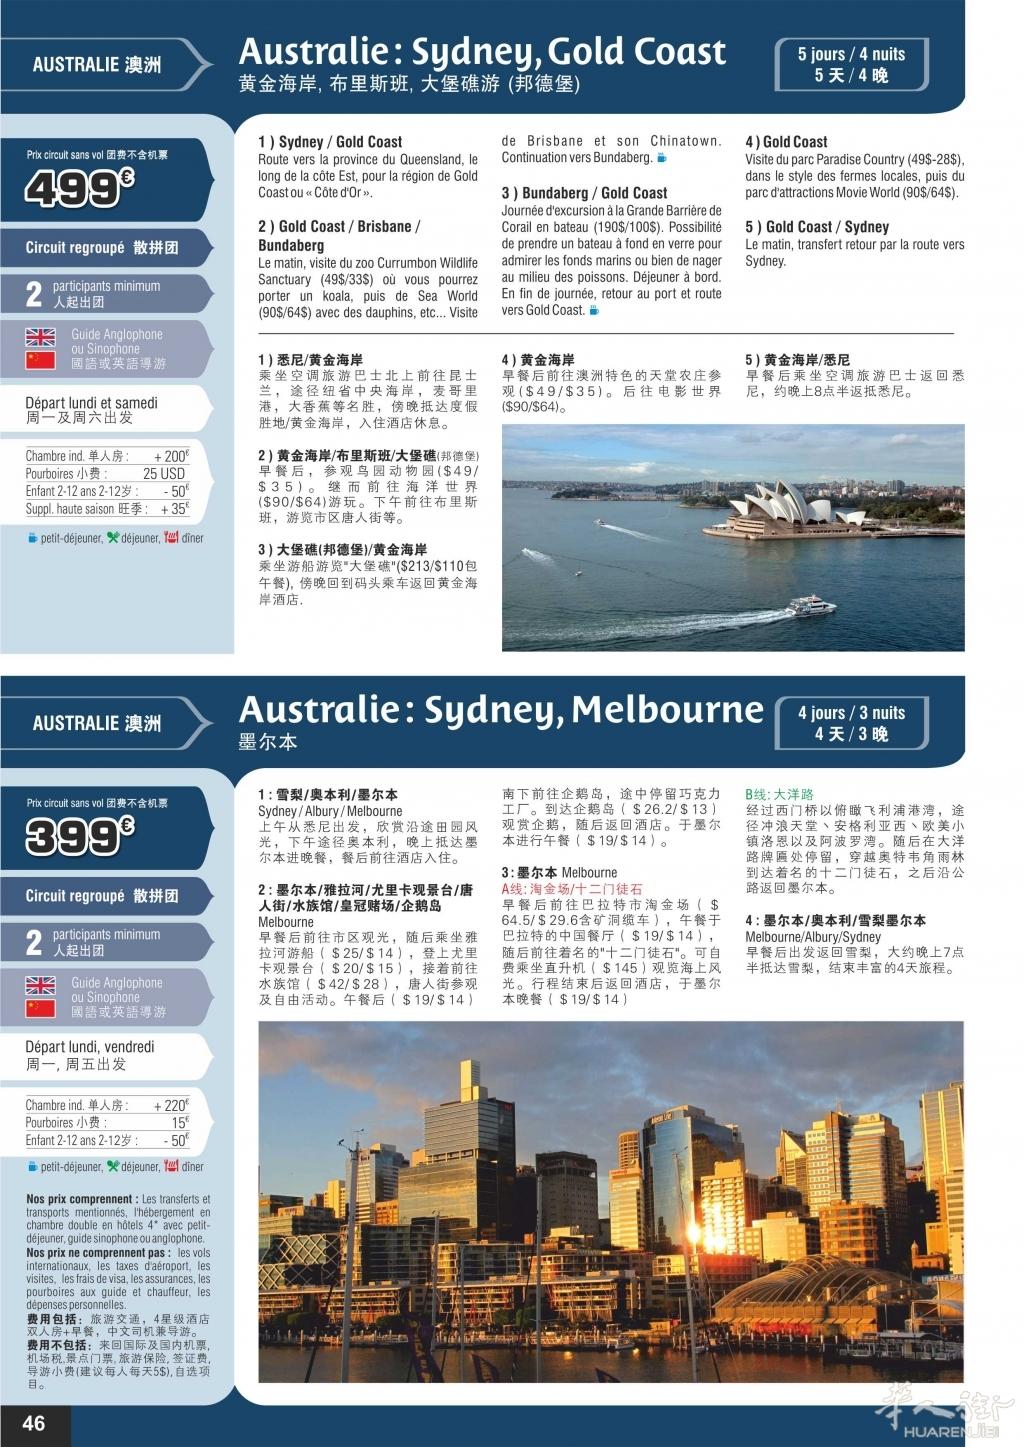 p46-Australie-Sydney, Gold Coast-5j-v06.jpg